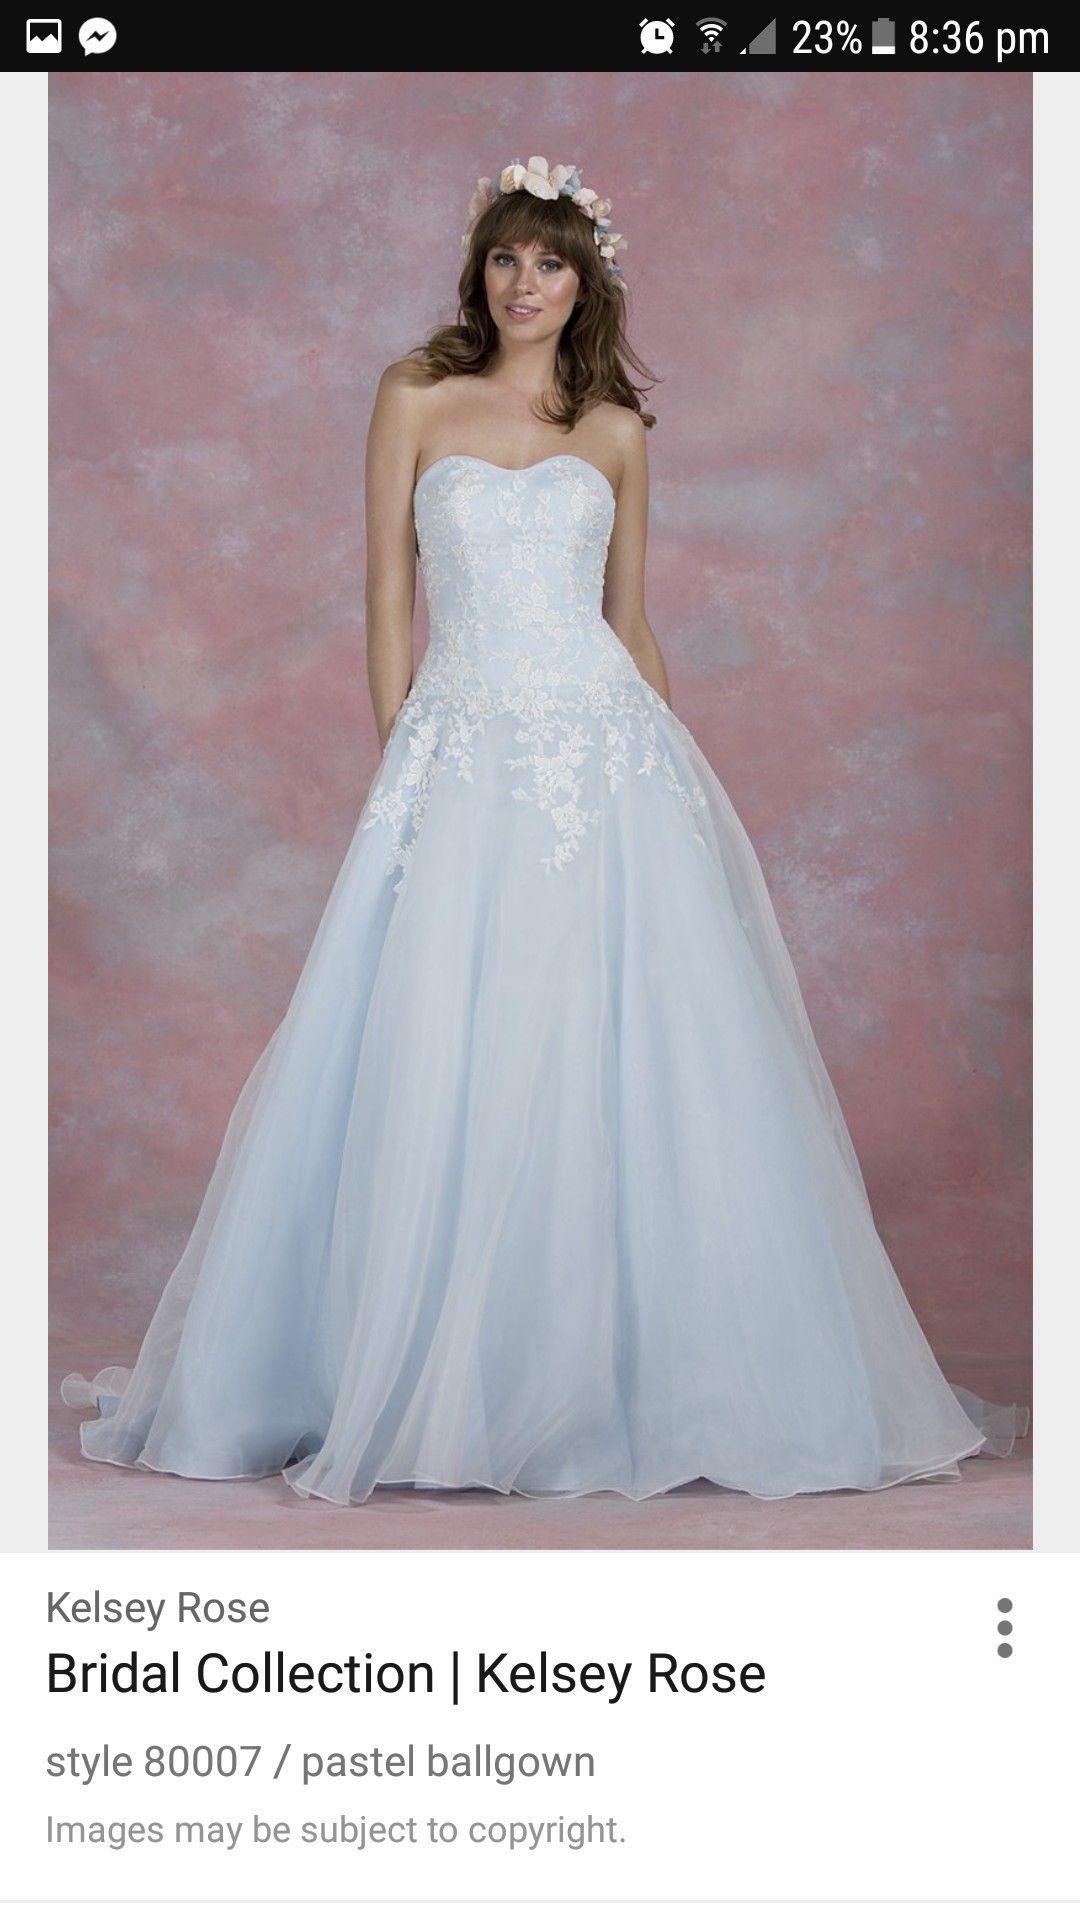 Pin by becky resuggan on wedding stuff! | Pinterest | Wedding stuff ...